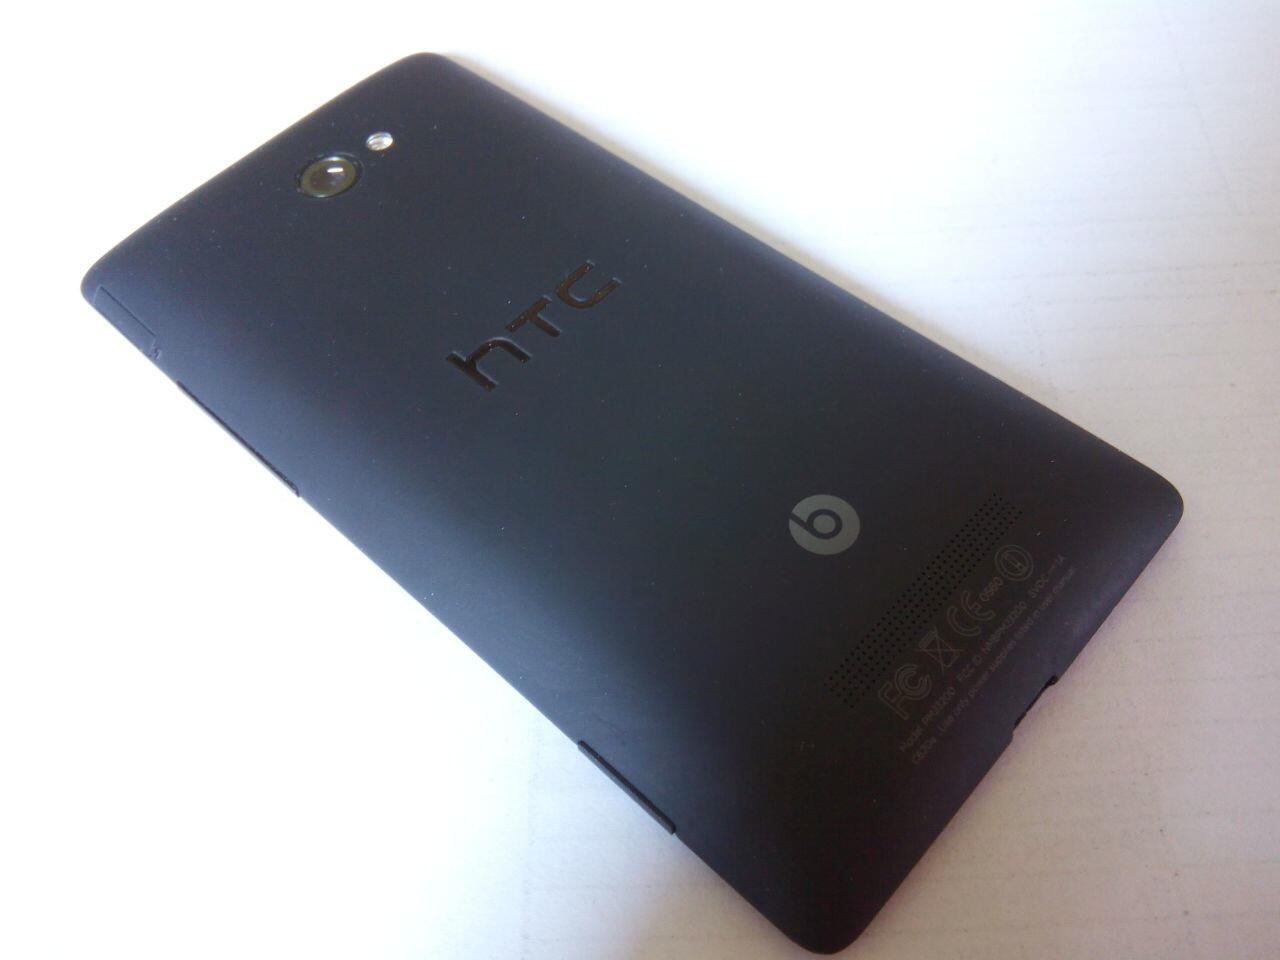 HTC 8x Windows 8.1 BBM Ready Semarang (pesaing Lumia 920)